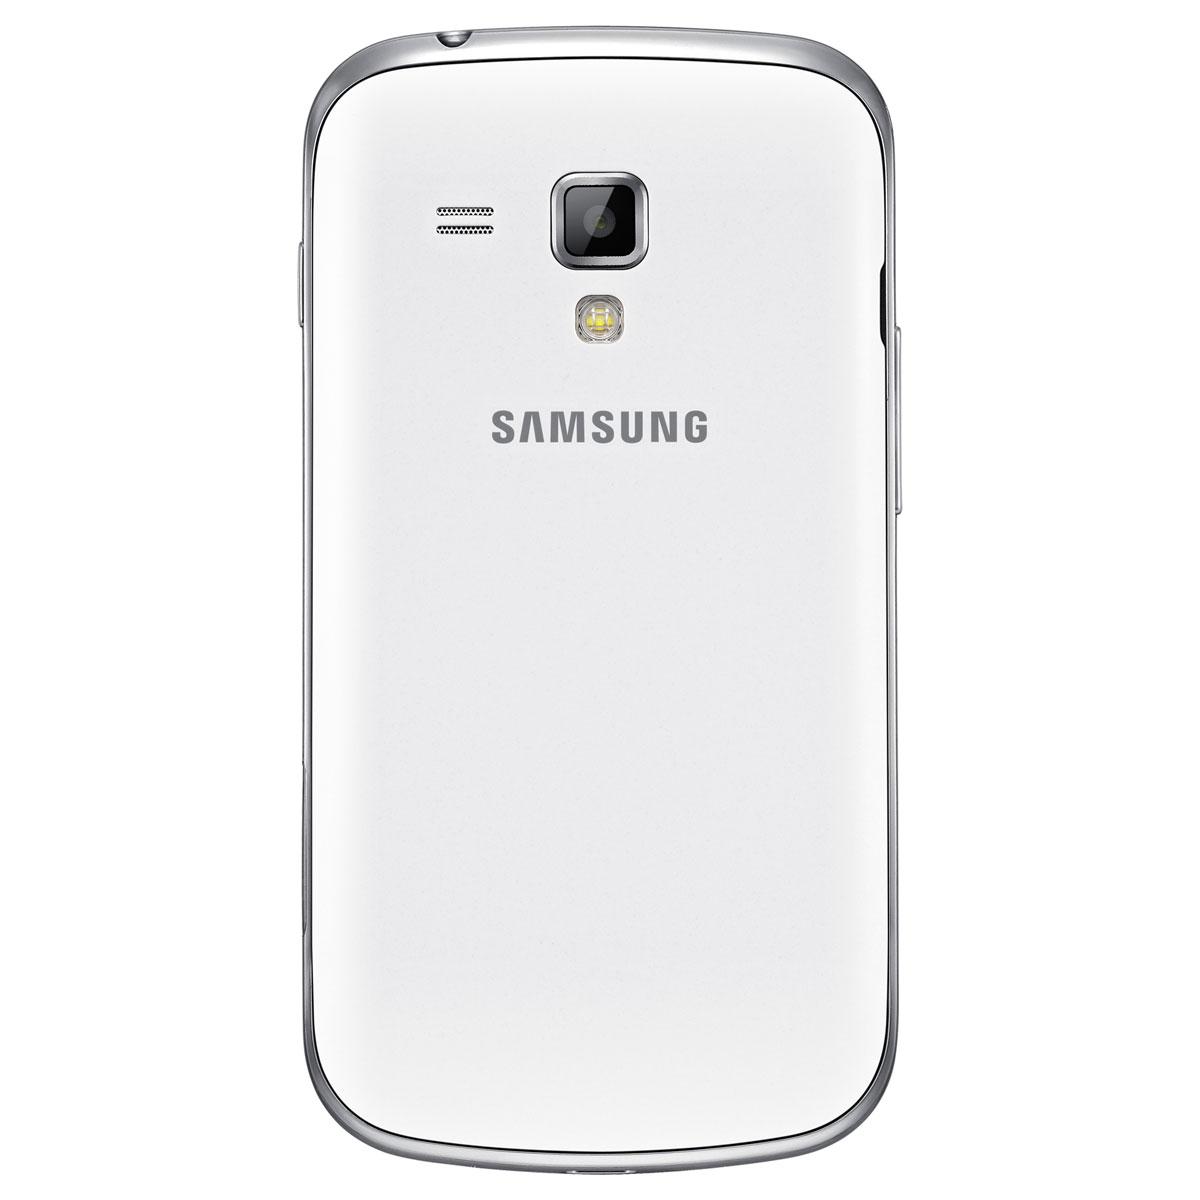 Samsung galaxy trend gt s7560 blanc mobile smartphone - Portable samsung galaxy trend lite blanc ...